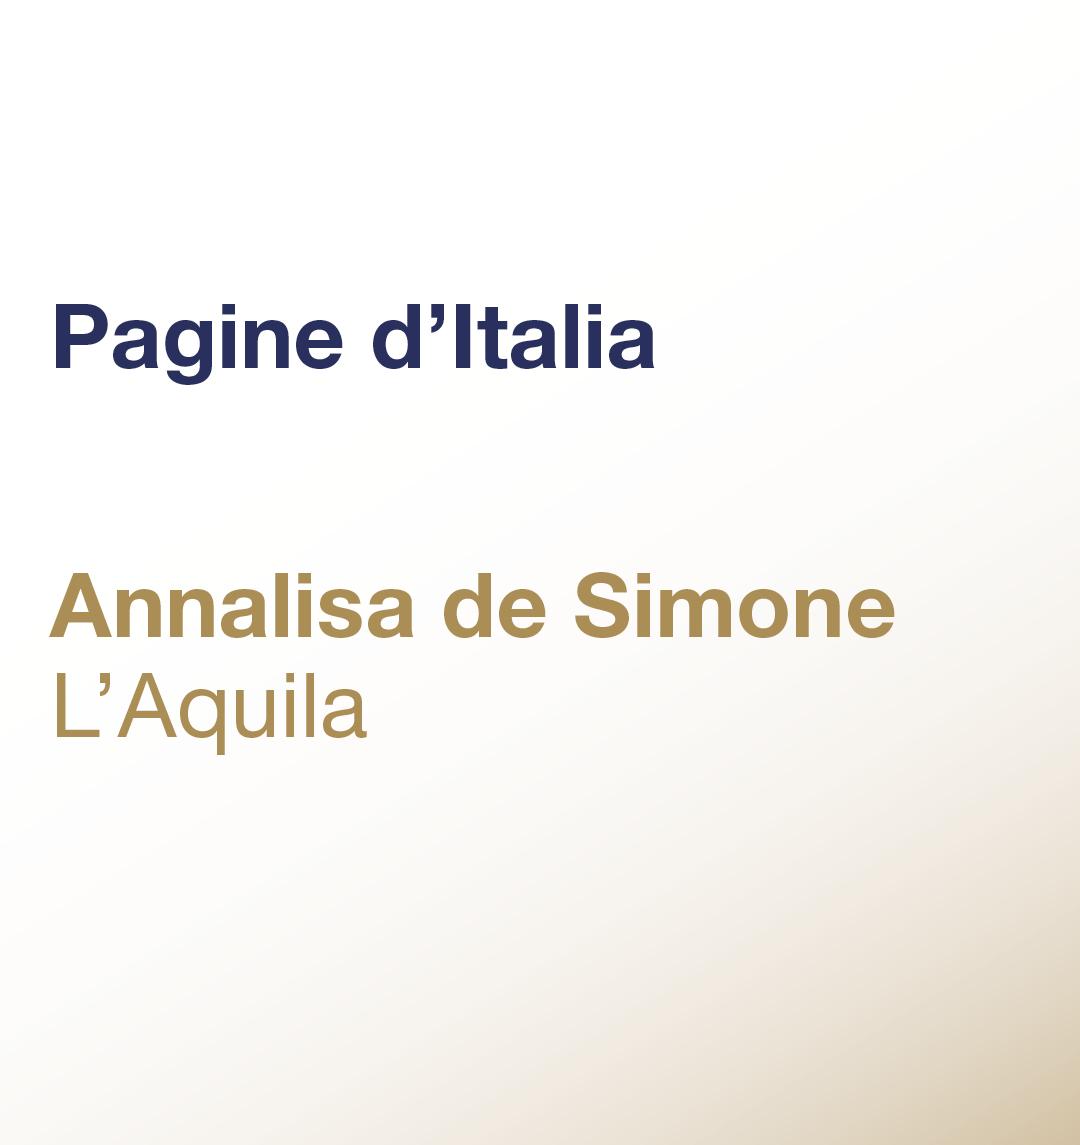 Pagine d'Italia – Annalisa De Simone – L'Aquila